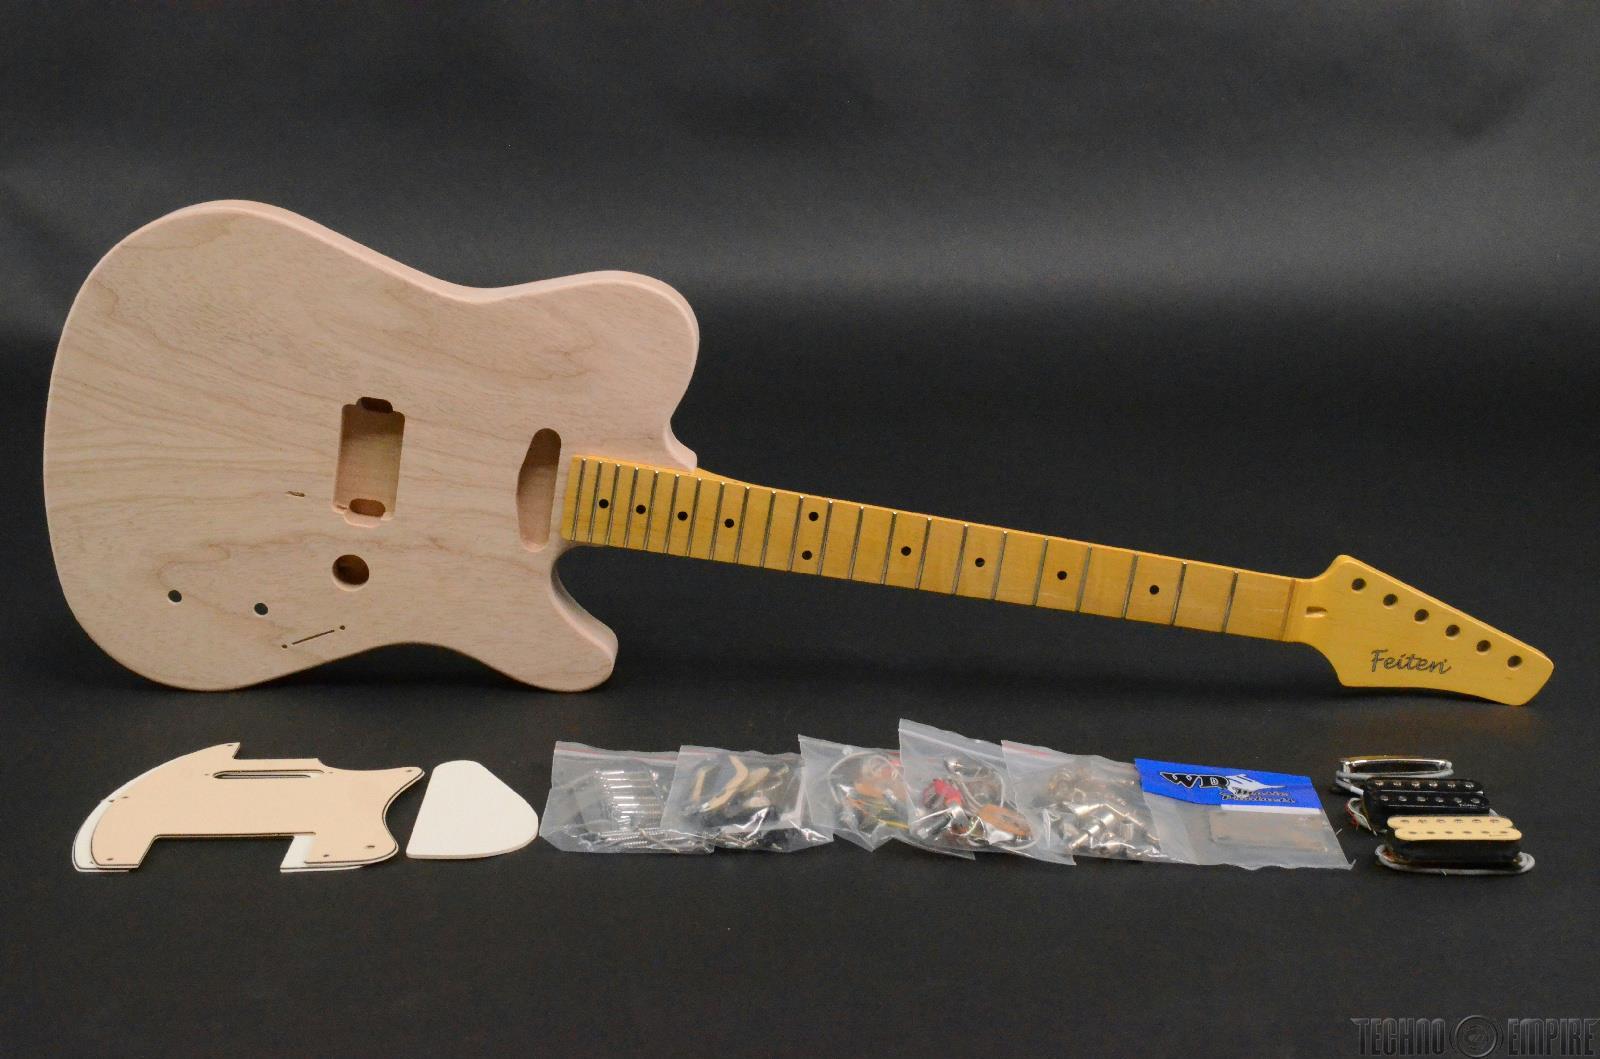 buzz feiten elite pro build your own electric guitar kit 28466 ebay. Black Bedroom Furniture Sets. Home Design Ideas